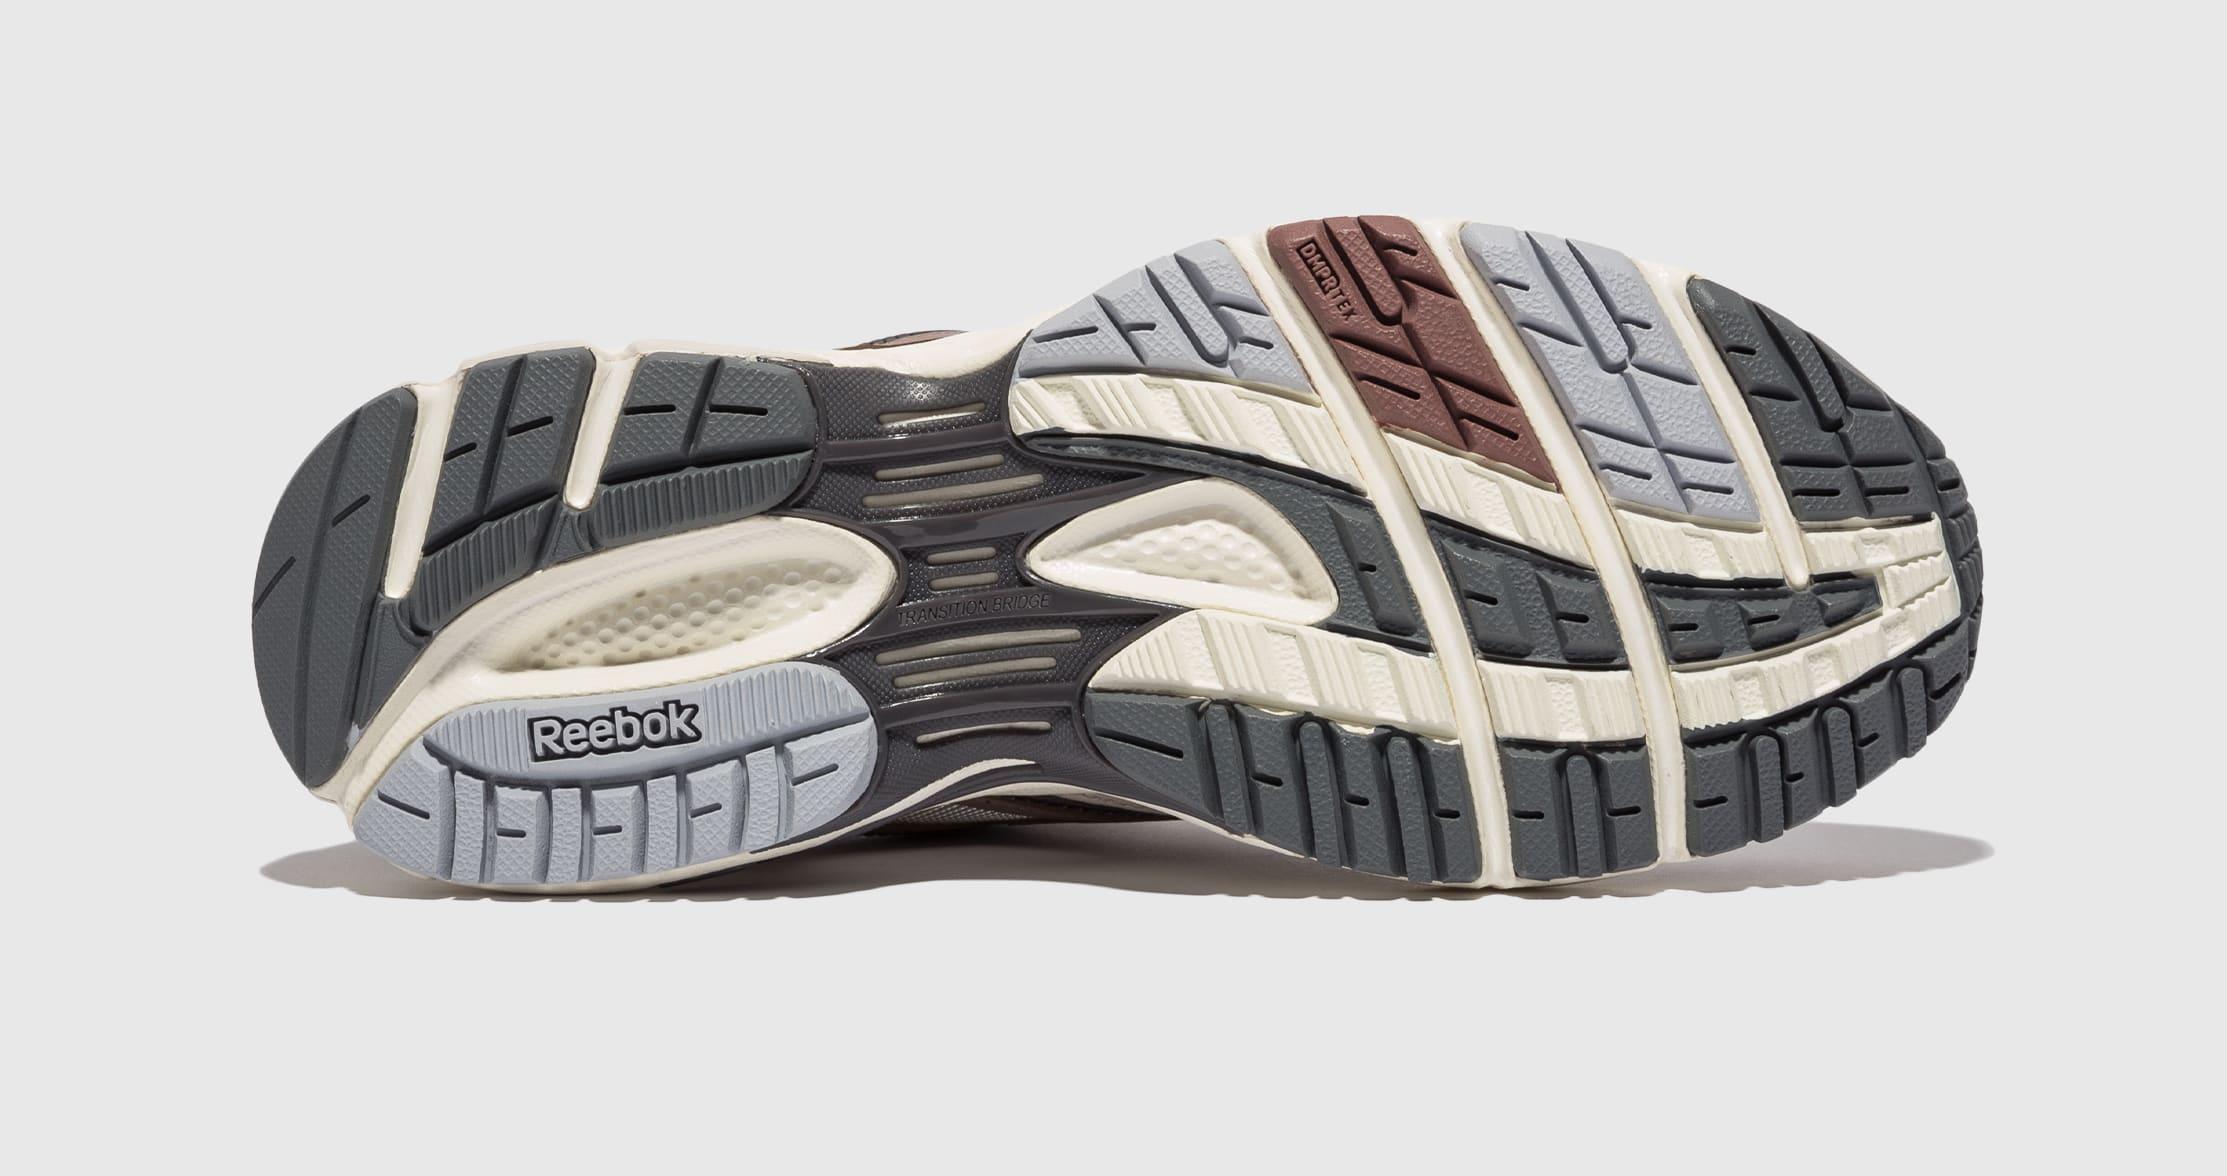 Packer Shoes x Reebok Trinity Premier Cream FY3409 Outsole